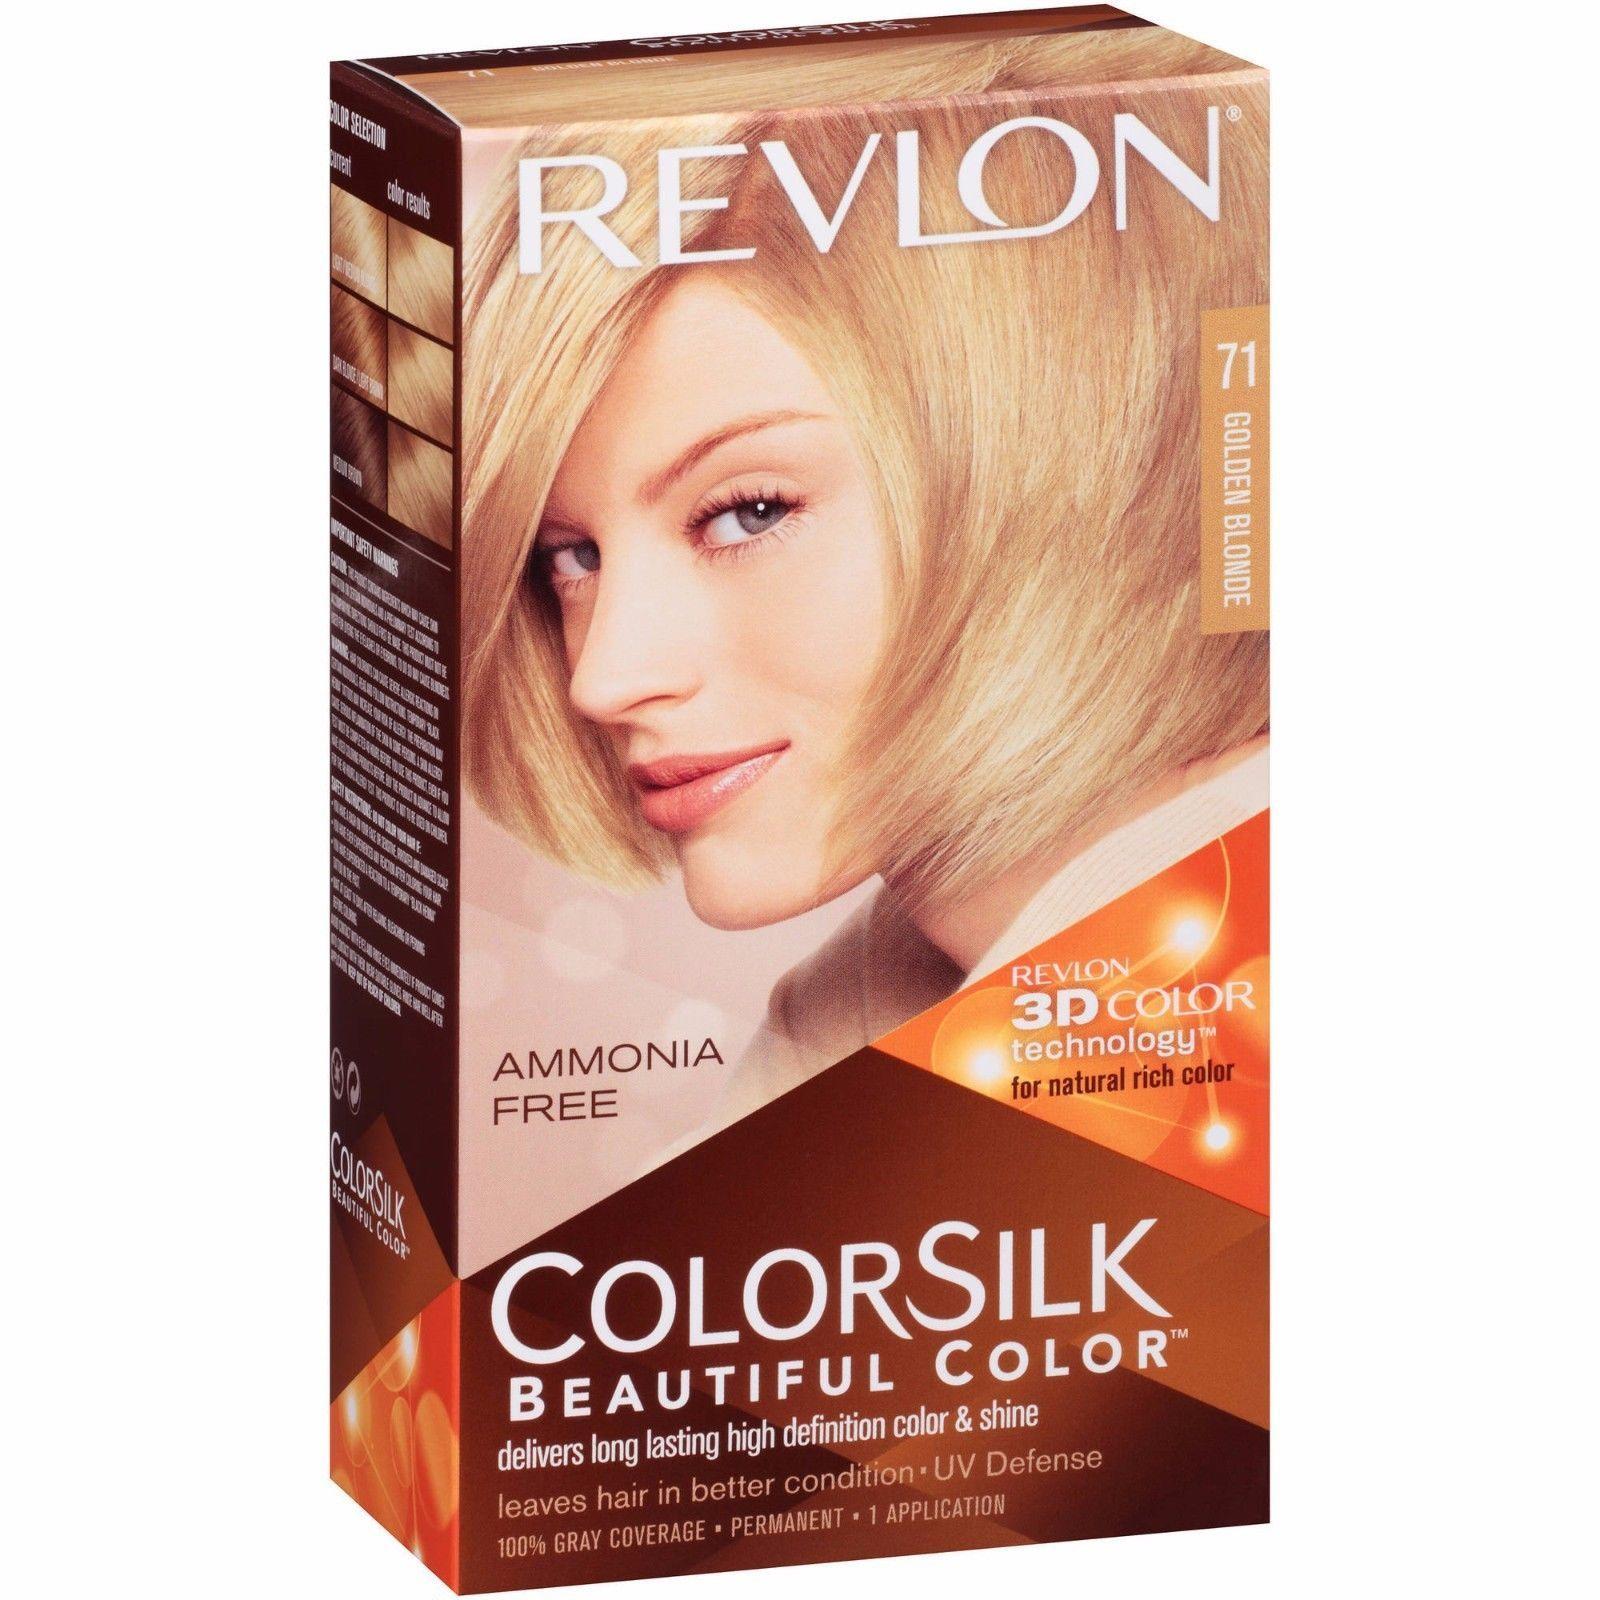 Revlon Colorsilk Beautiful Color 74 Natural